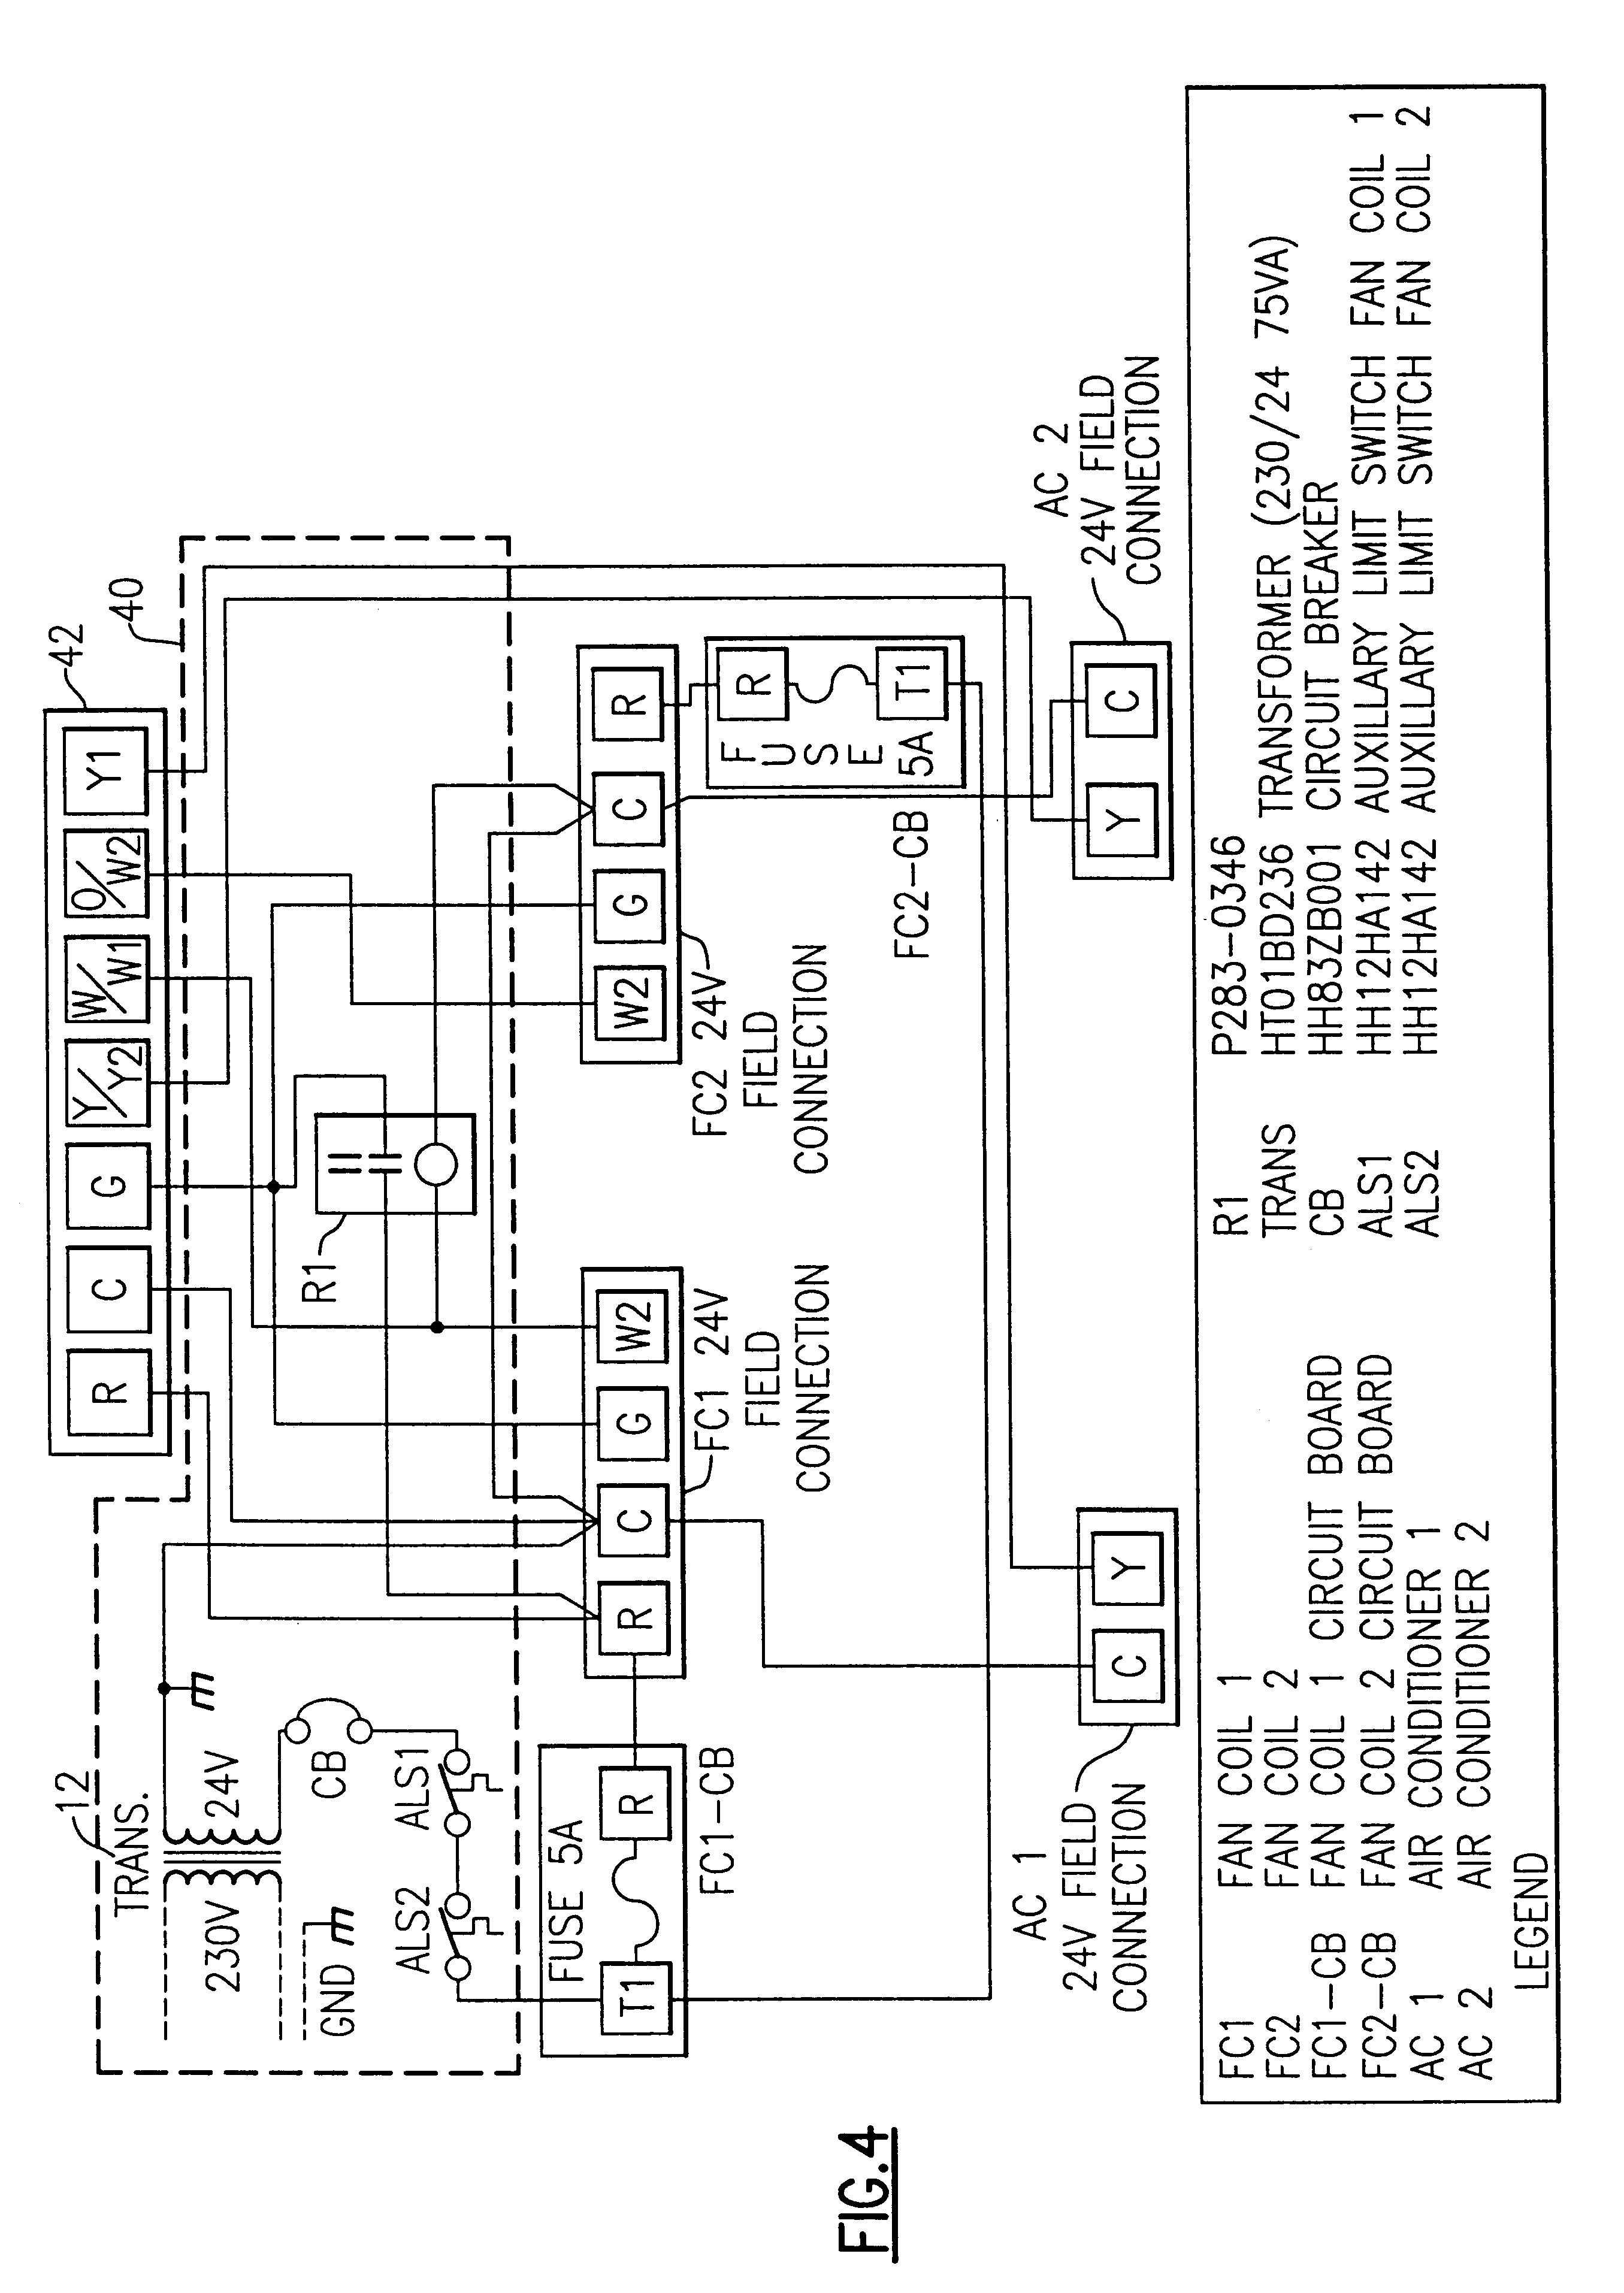 Snap Ruud Water Heater Thermostat Wiring Diagram Air Imageresizertoolcom